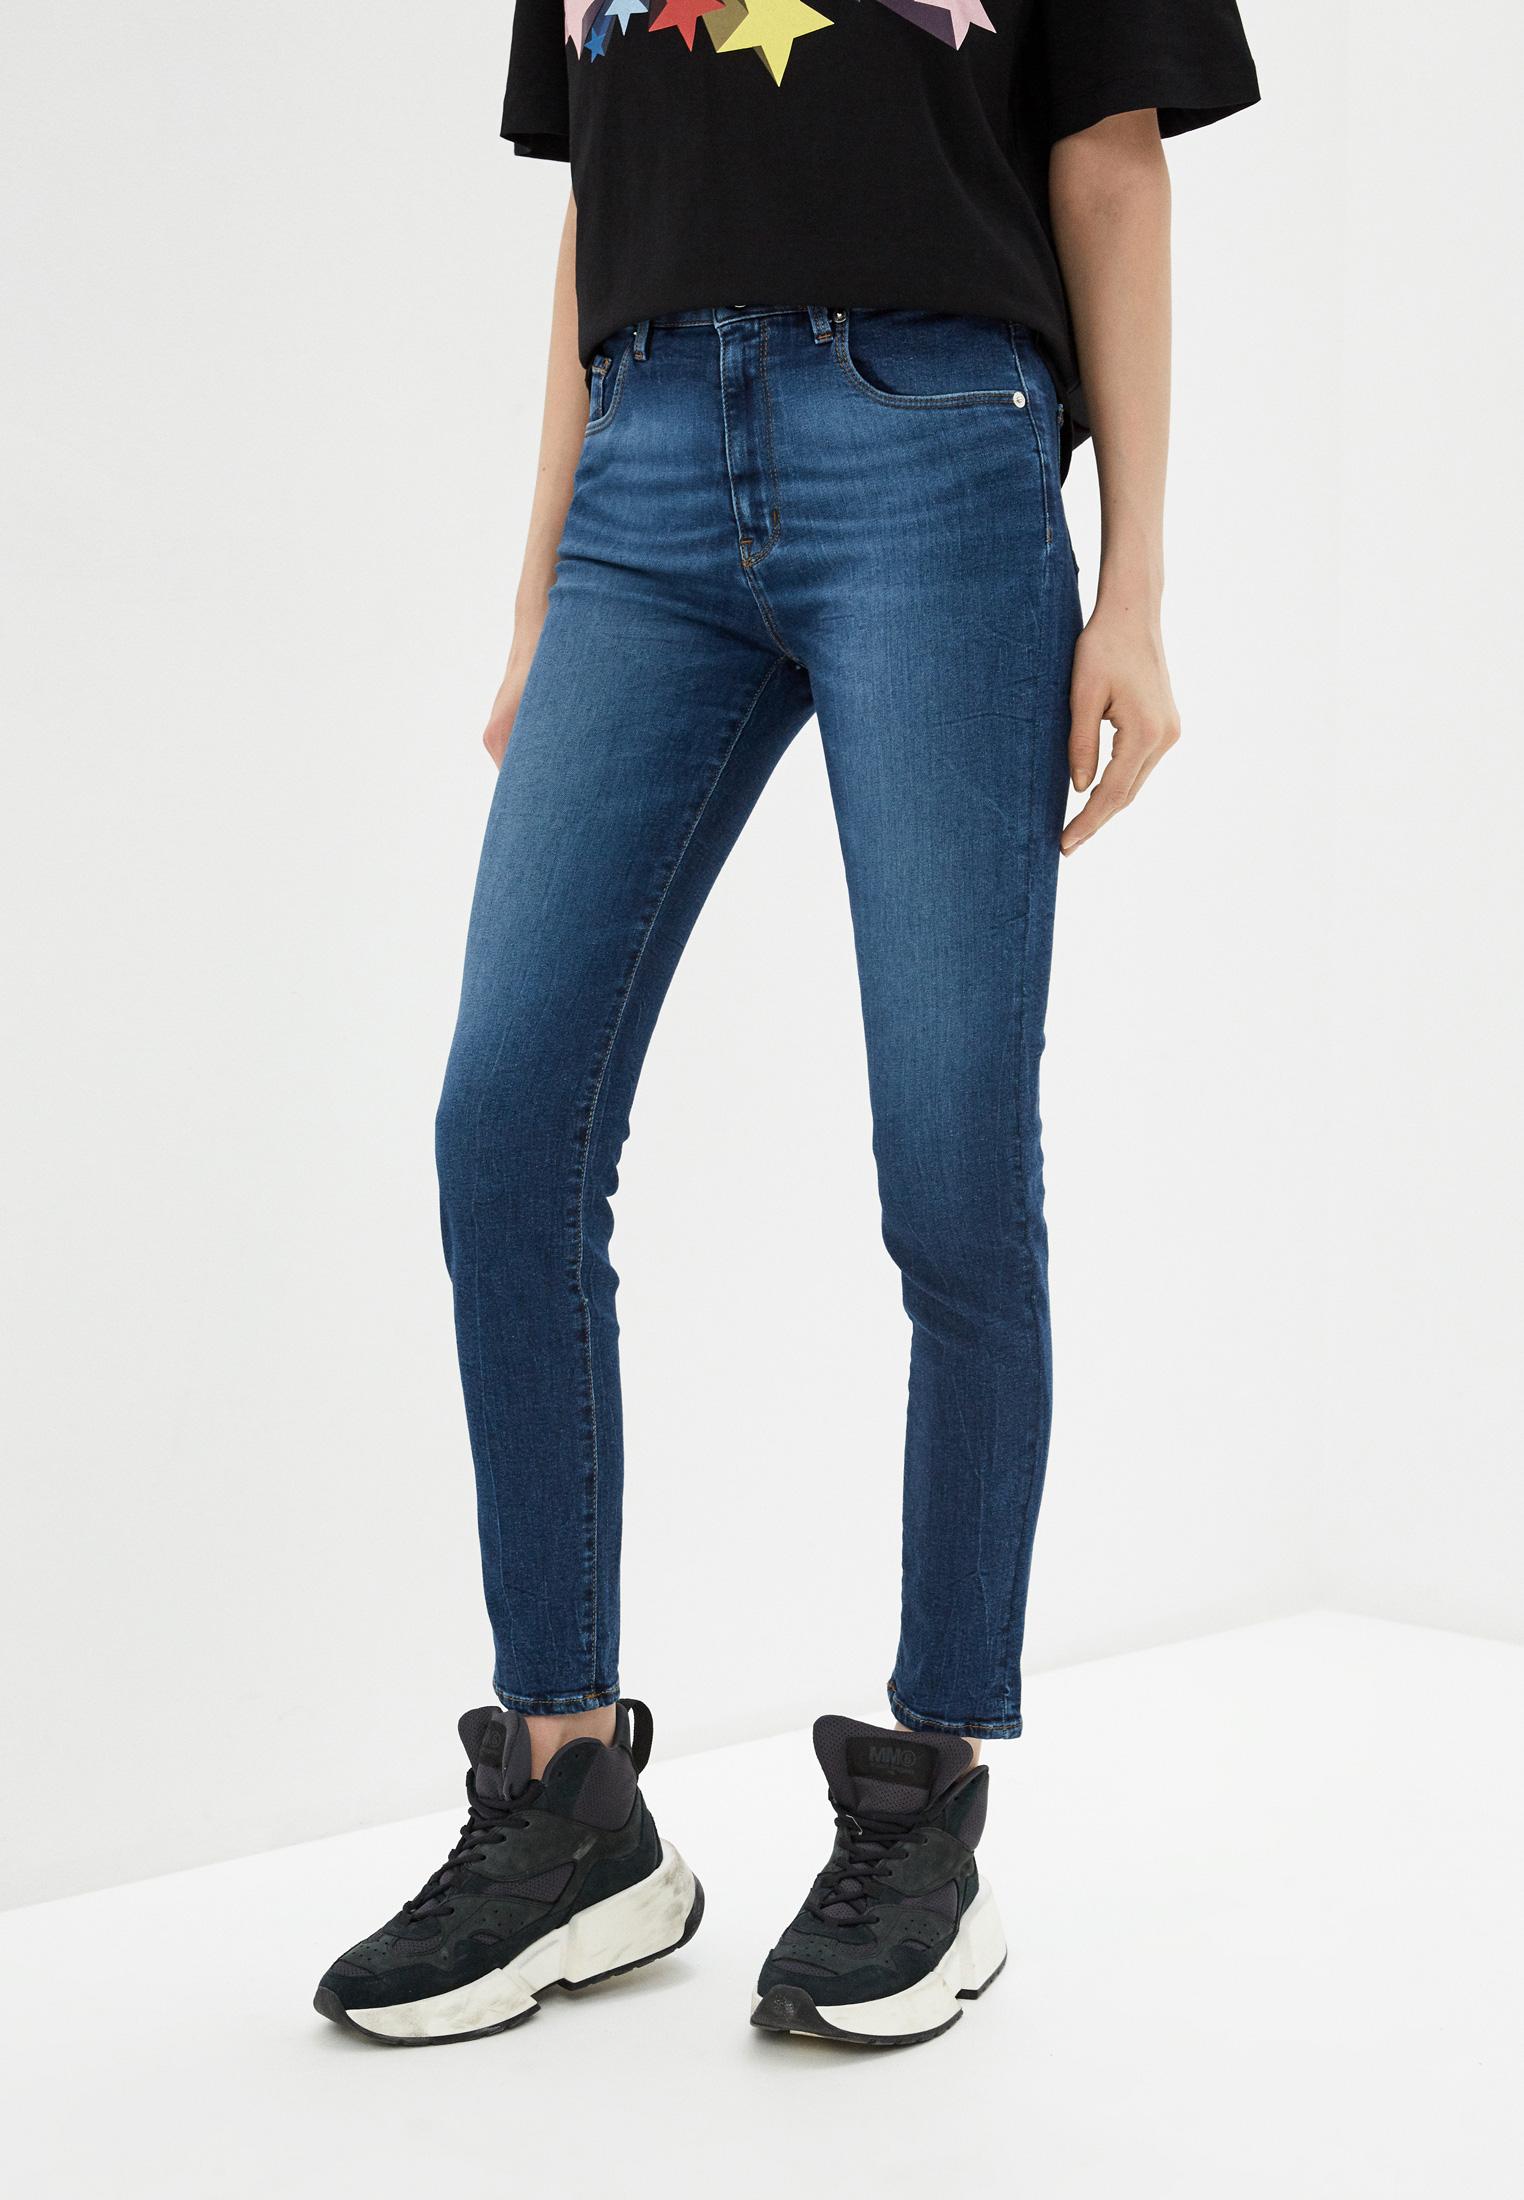 Зауженные джинсы Love Moschino W Q 436 03 S 3379